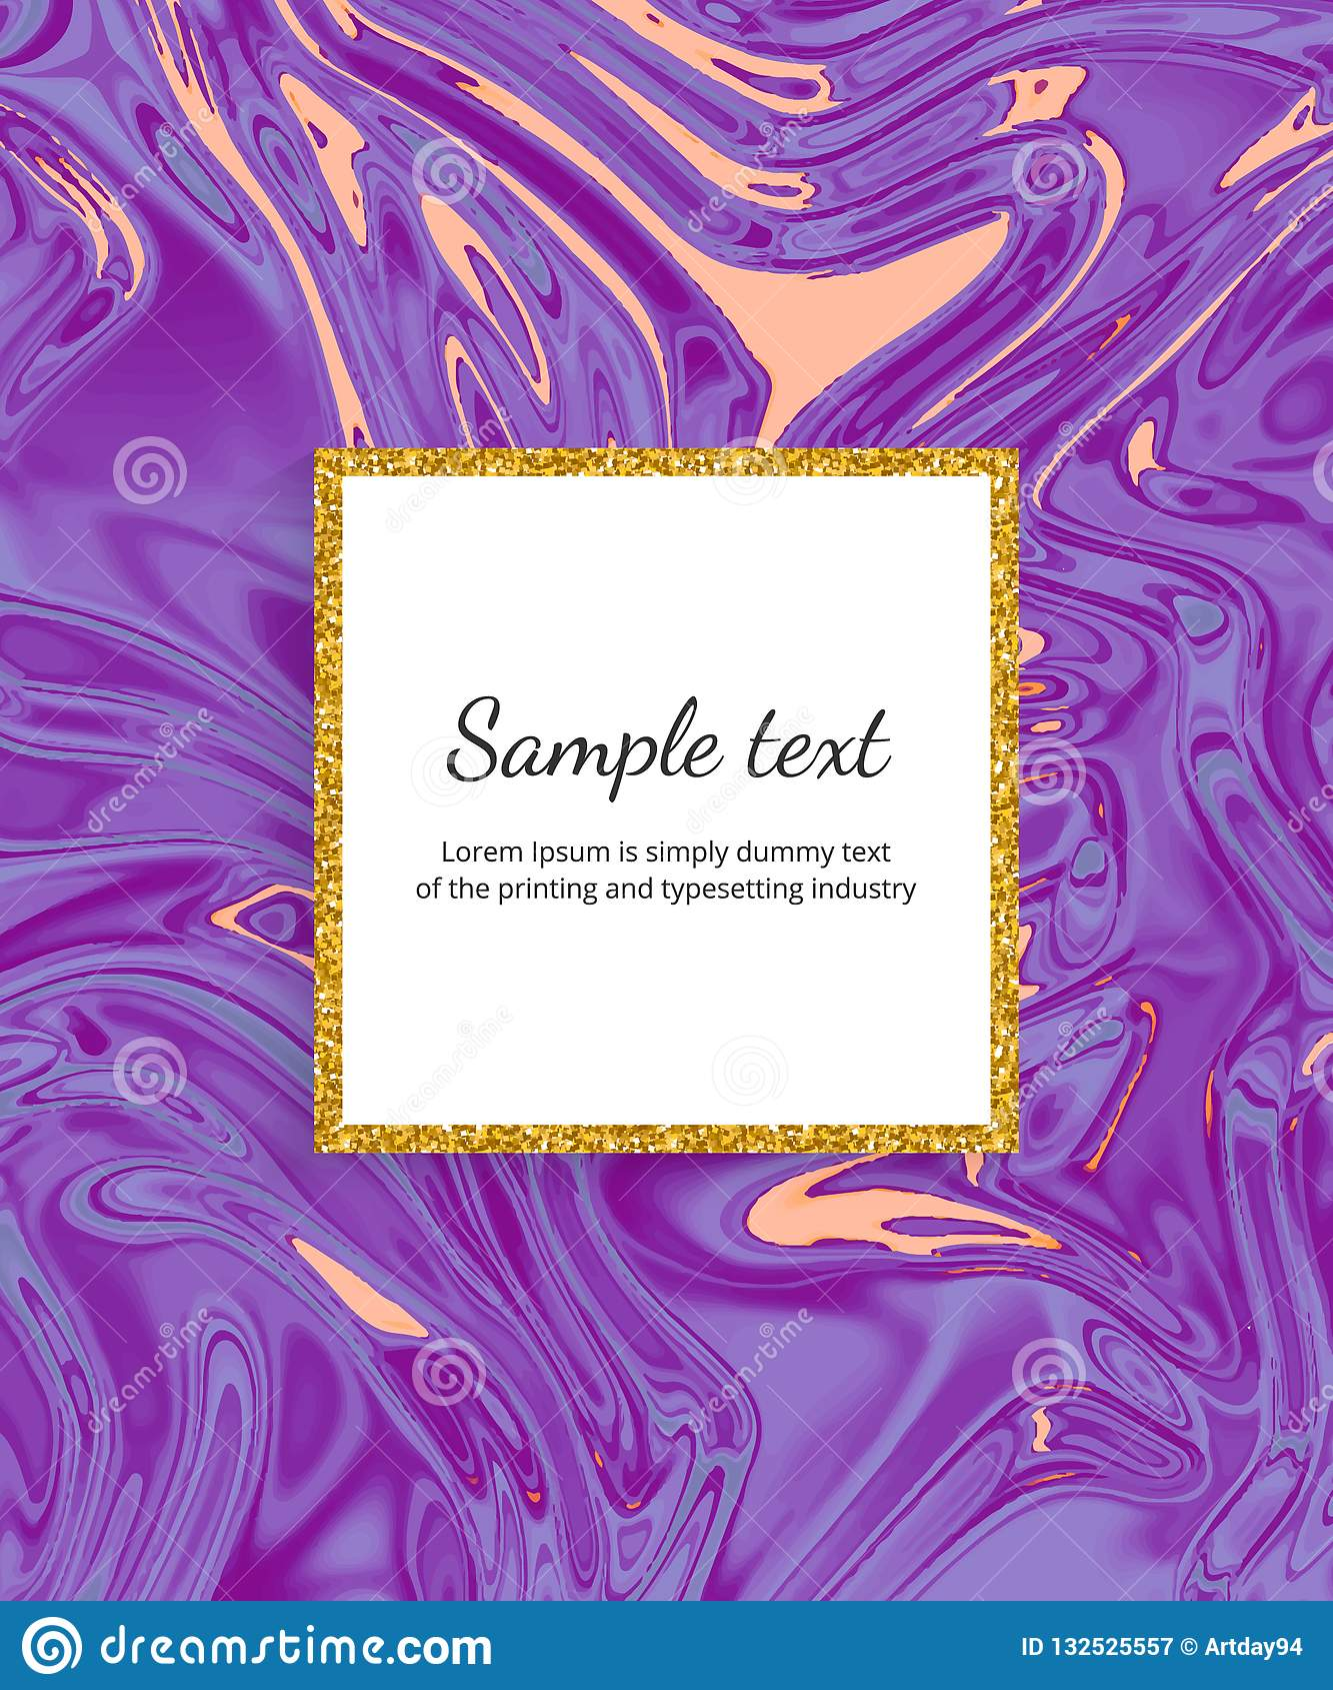 Tarjeta de mármol púrpura líquida de la textura La tinta ondula el fondo del diseño de la acuarela Plantilla flúida de moda para